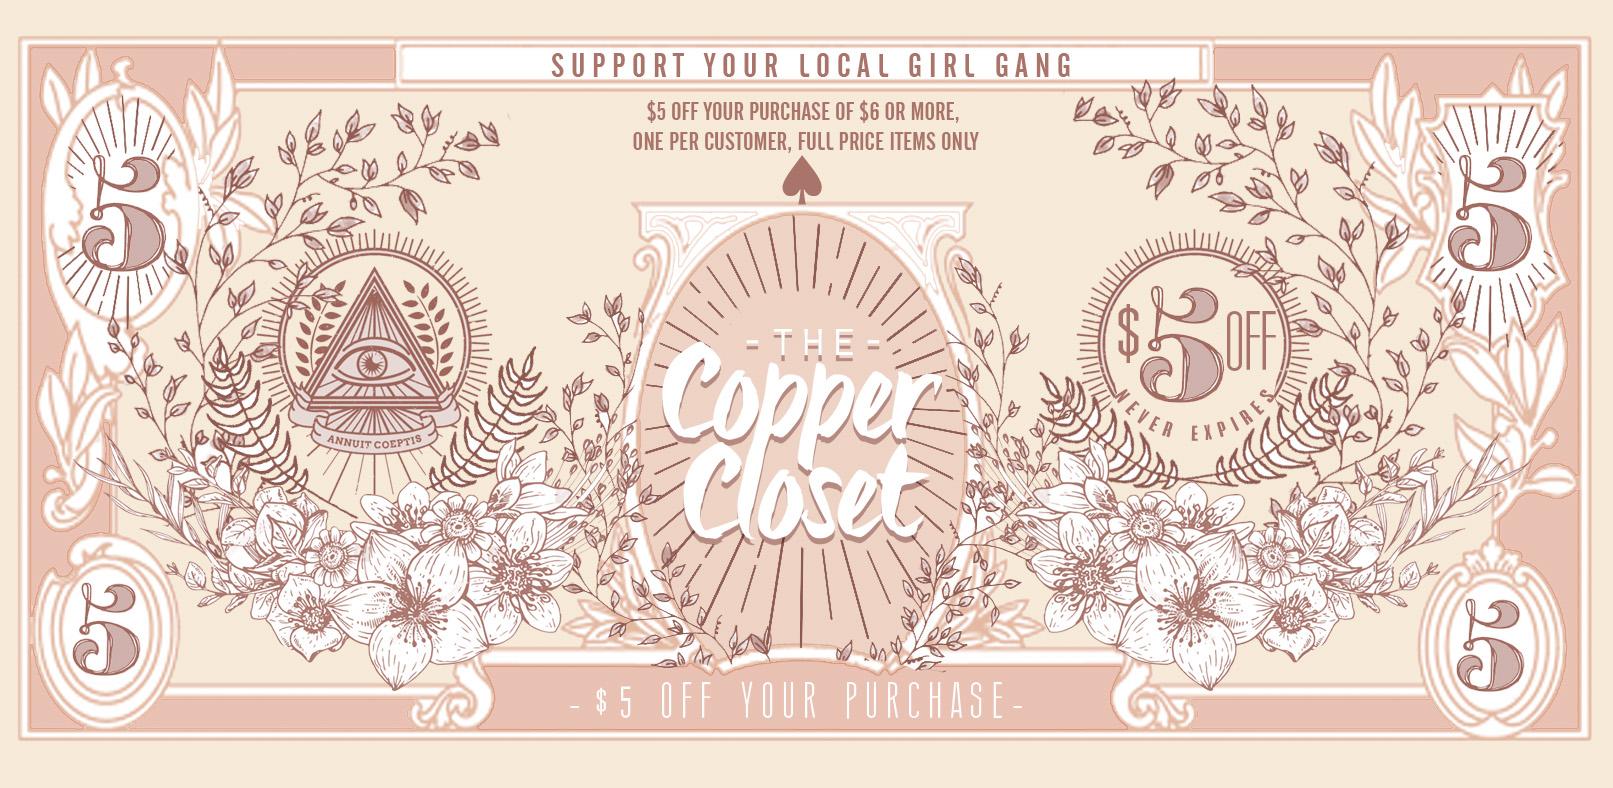 Copper Cash